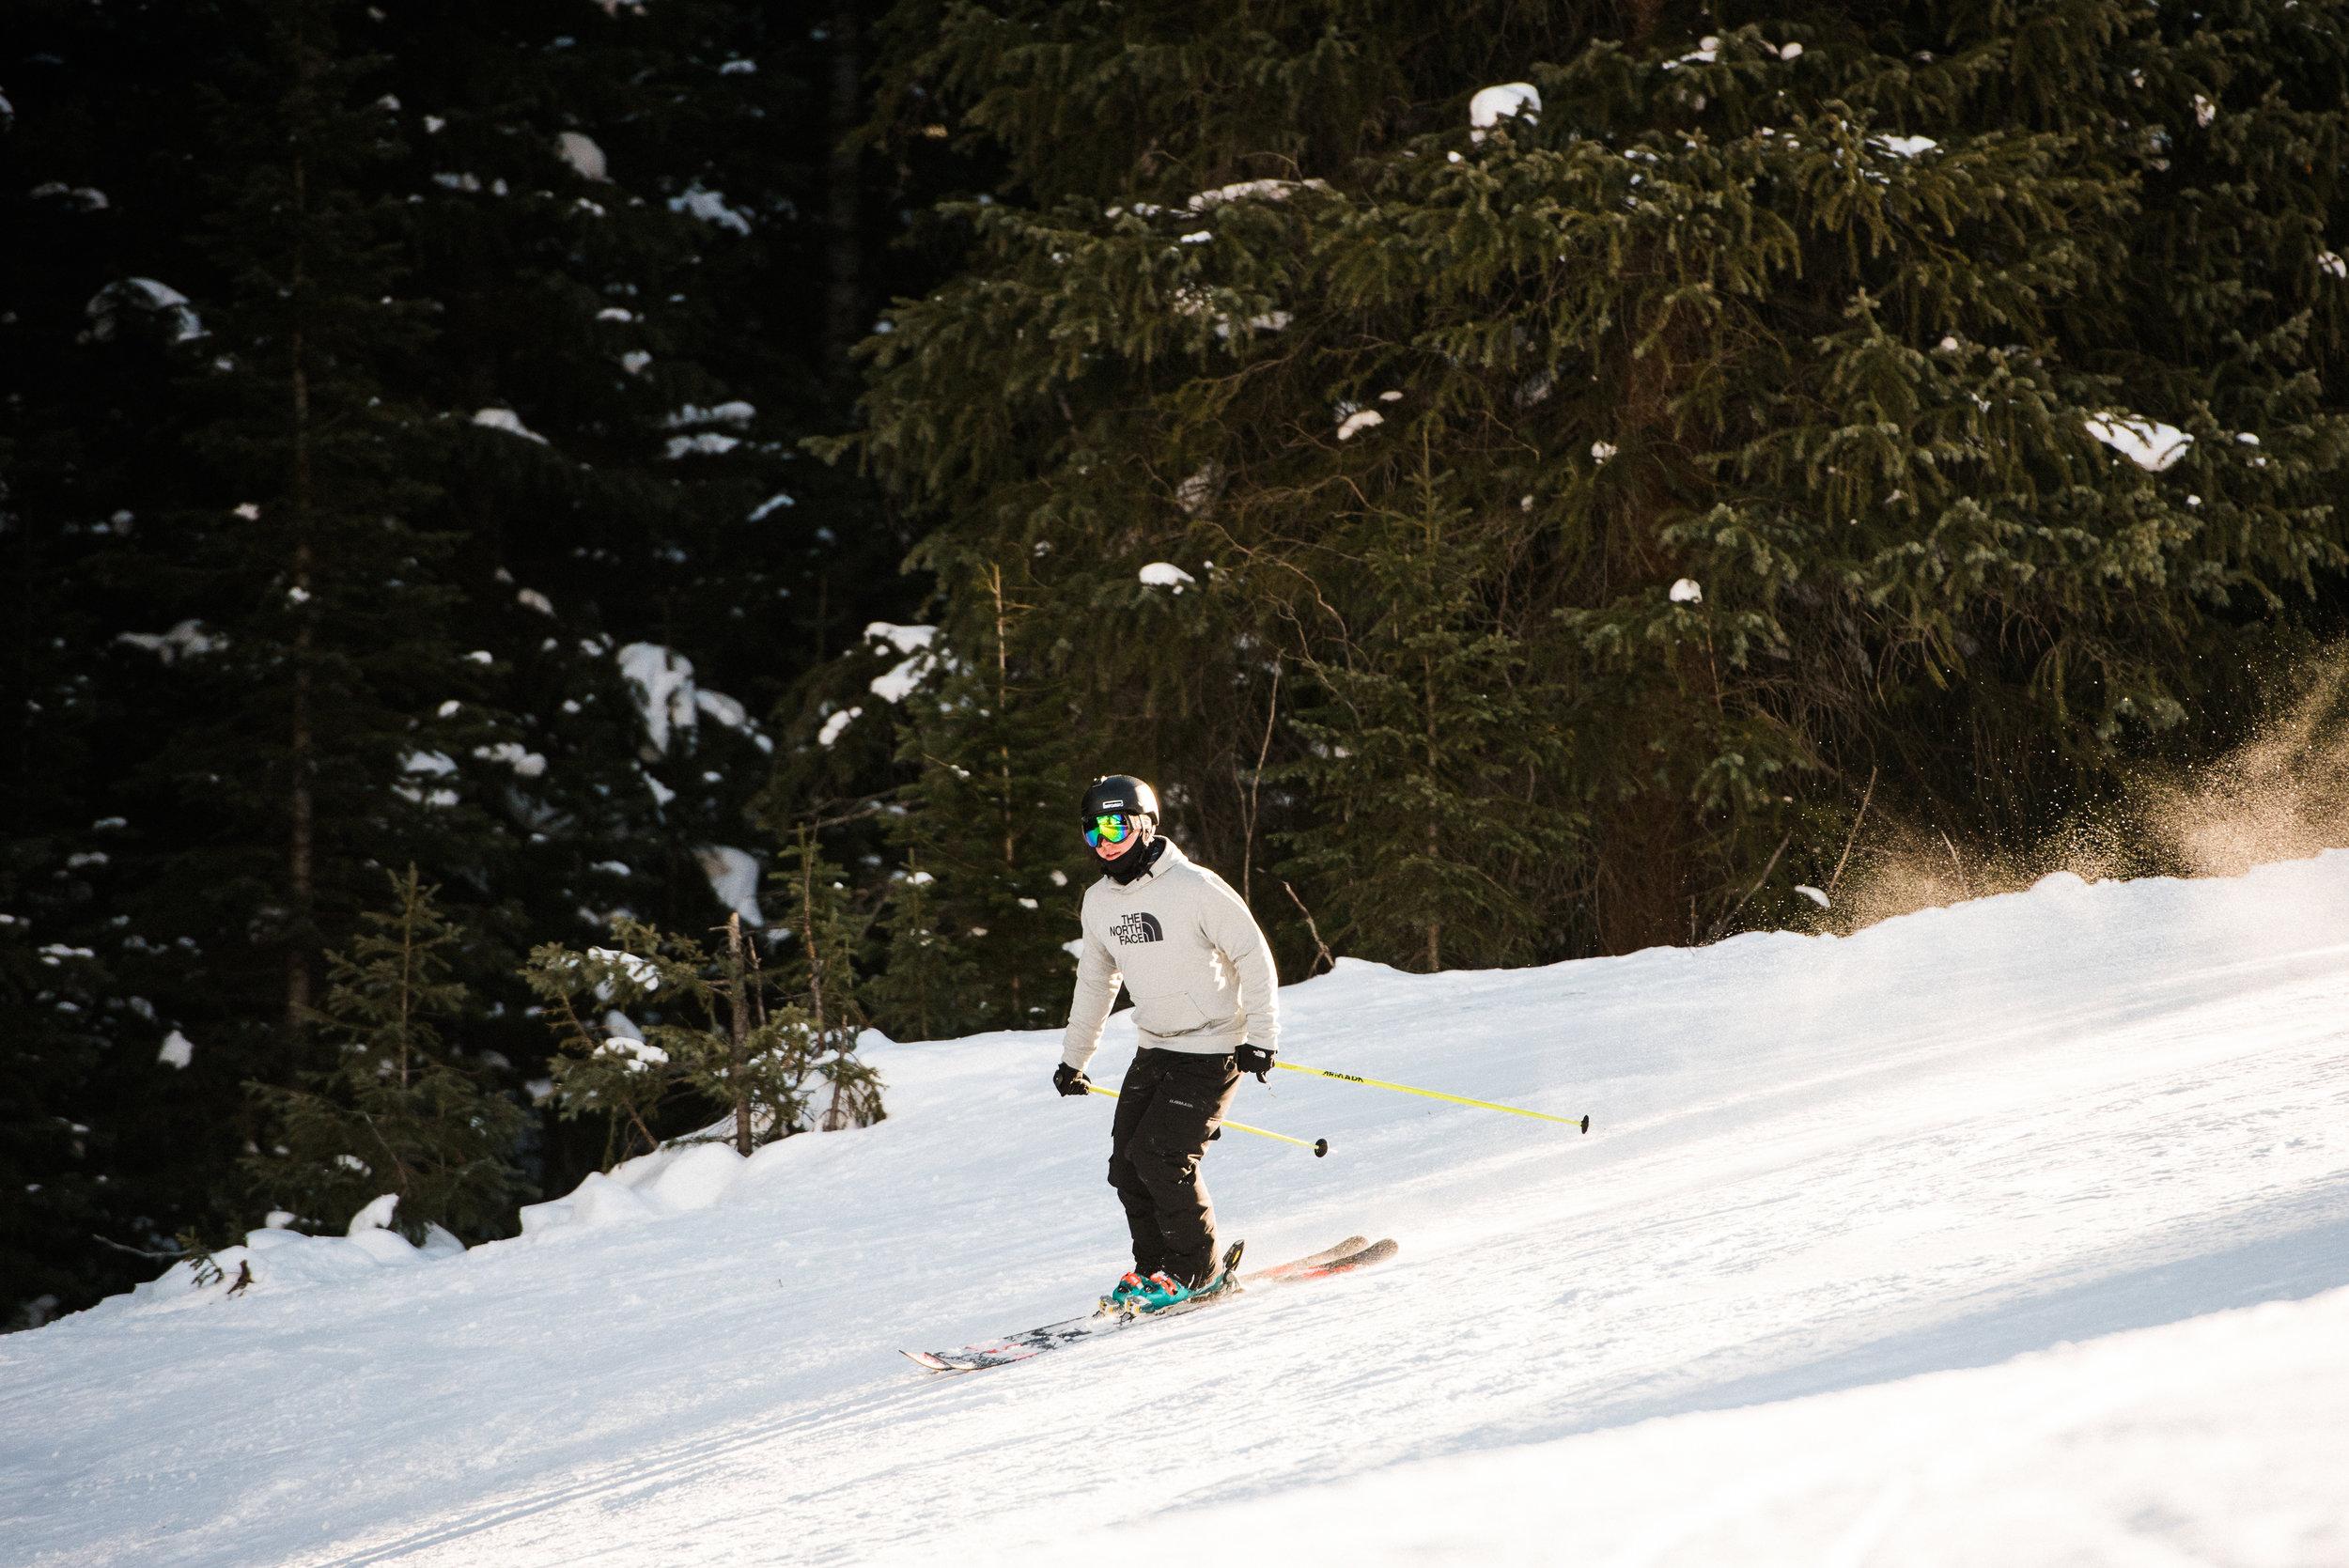 TaraShupe_Outdoor_Photographer_Loweprobags_Colorado_Copper_Mountains_Ski_51.jpg